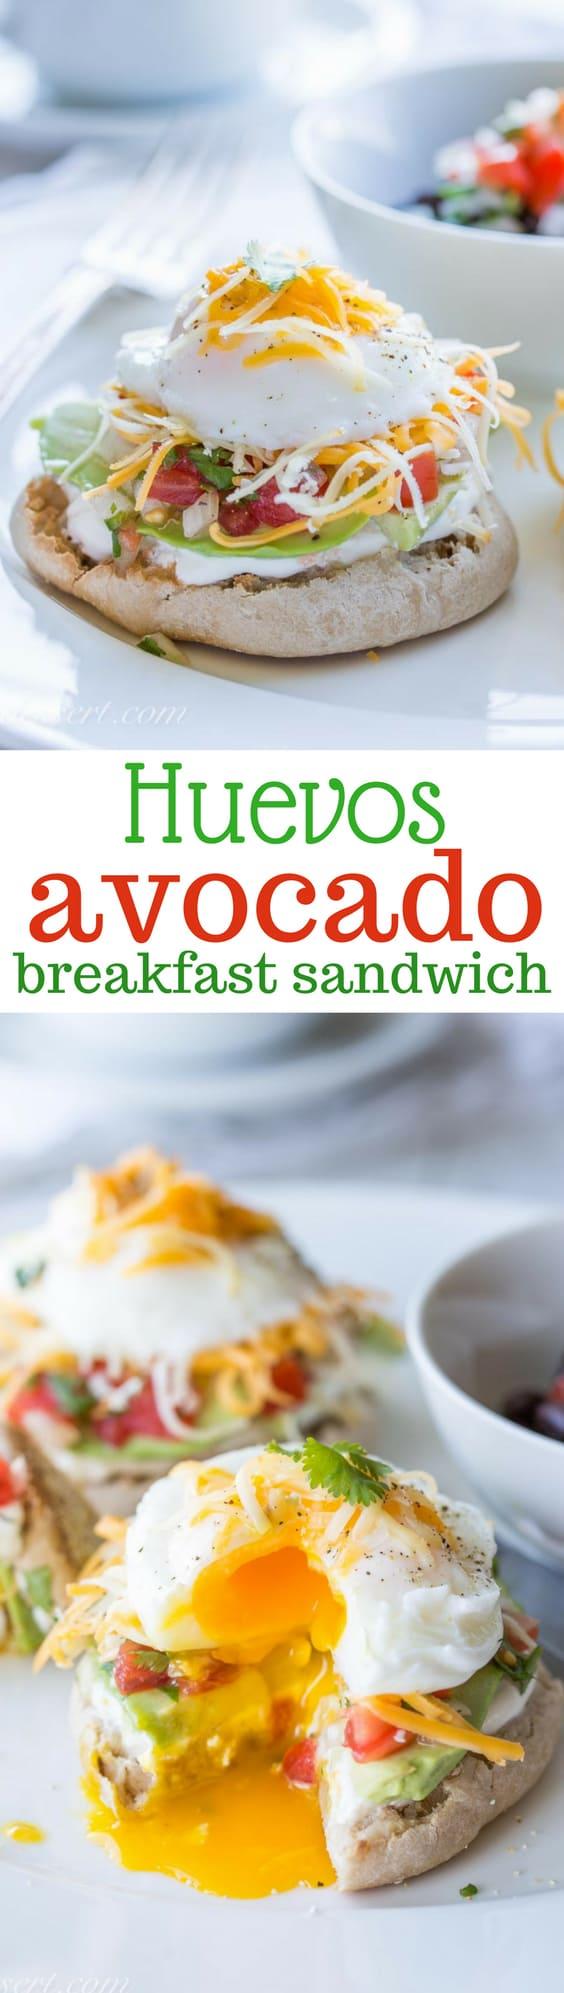 Huevos Avocado with Pico de Gallo - a terrific breakfast sandwich loaded with fresh pico de gallo, cheese, and perfect poached eggs. www.savingdessert.com